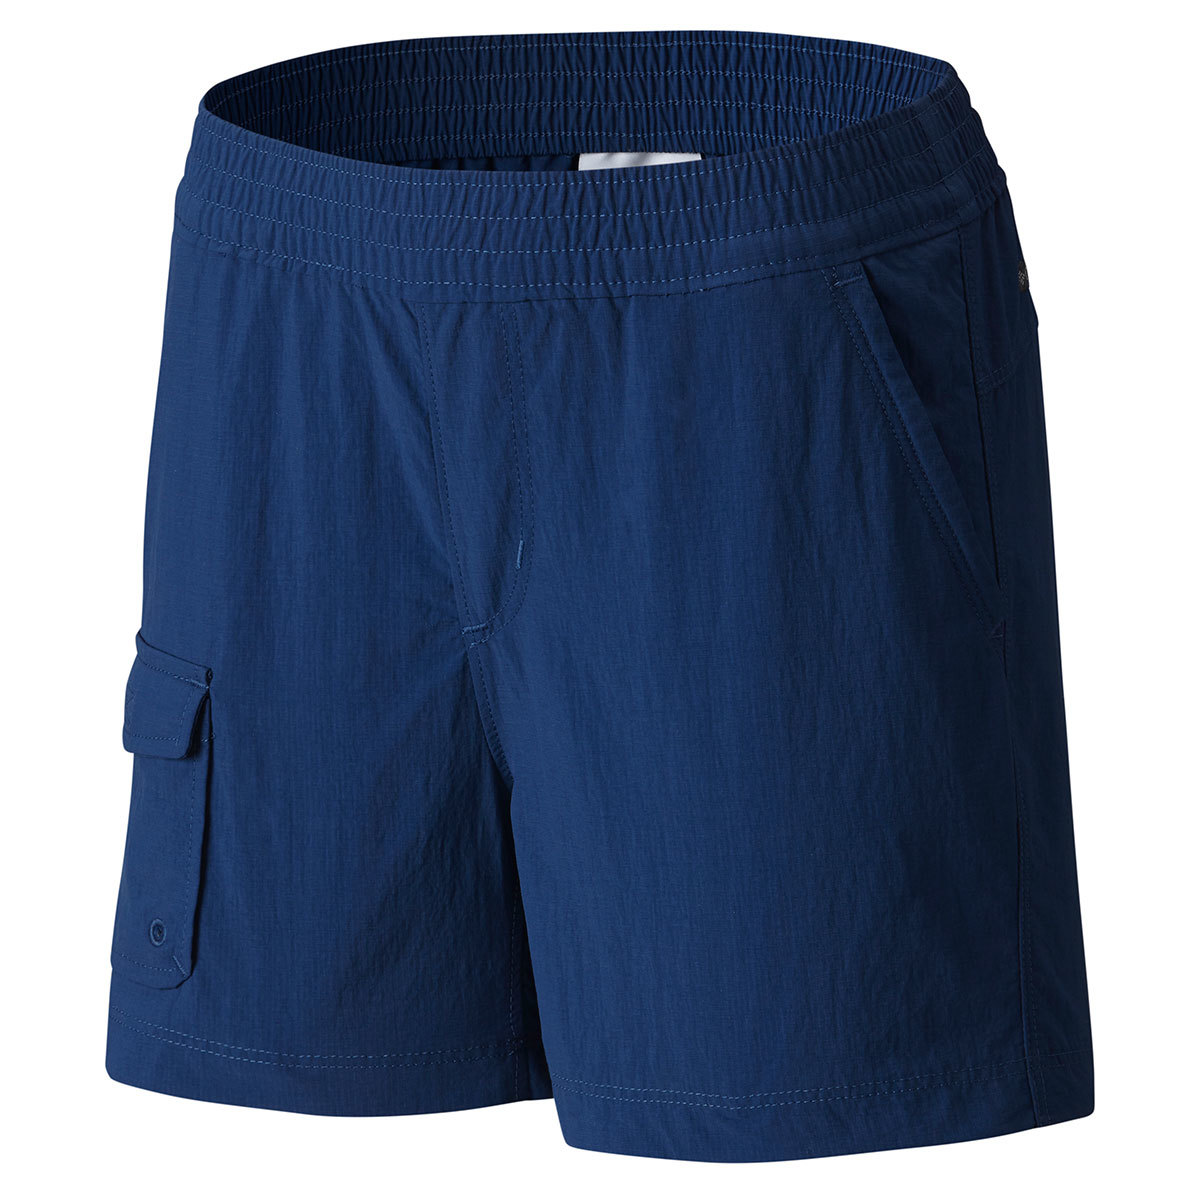 Columbia Big Girls' Silver Ridge Pull-On Shorts - Black, L